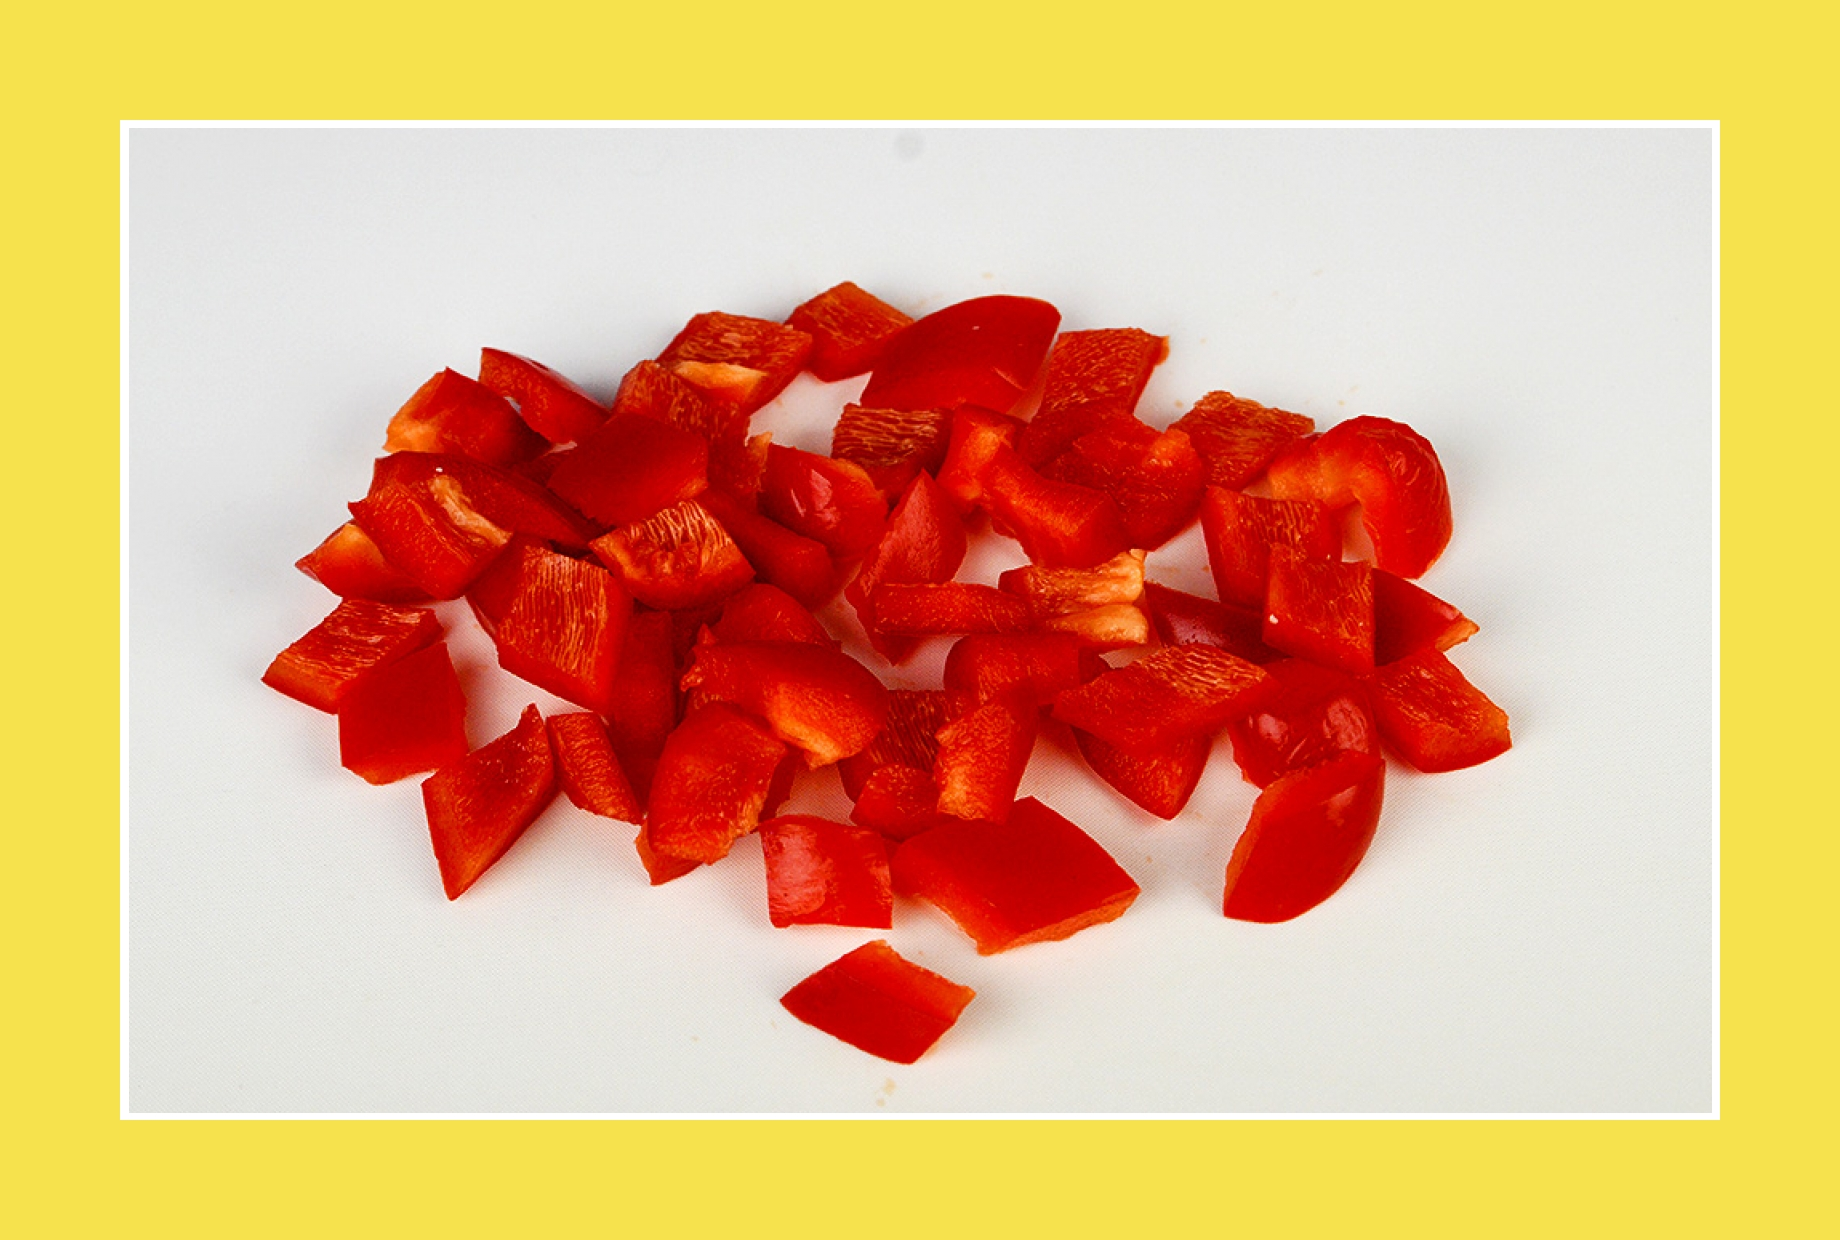 rote Paprika für Paprikasalat, bunten Salat